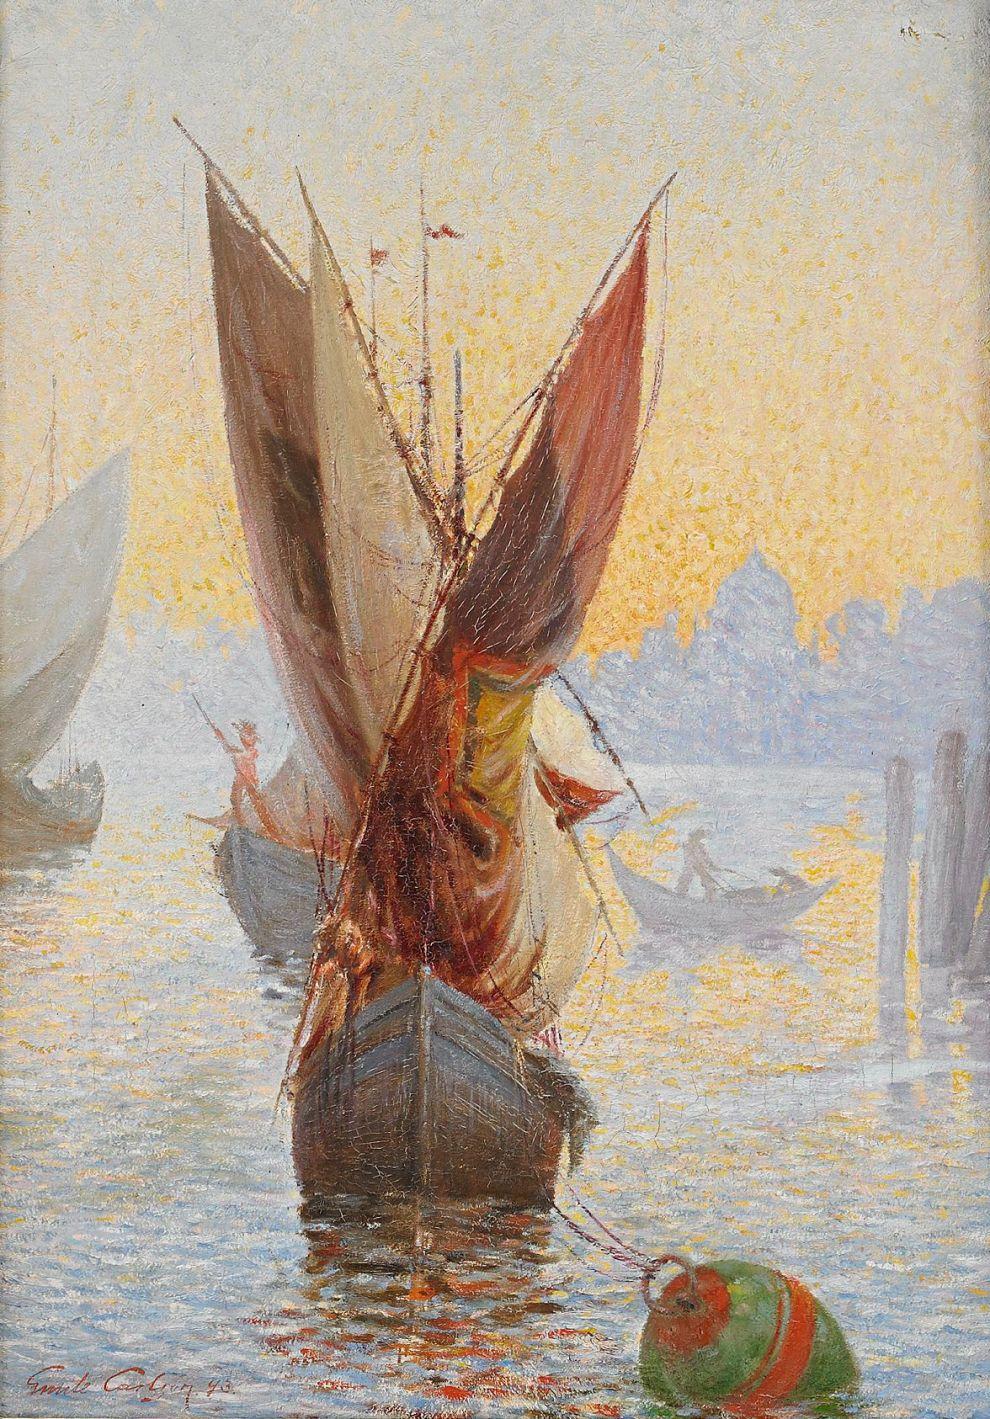 Emil Carlsen Sailing Ship at Dawn on the Lagoon of Venice, 1893